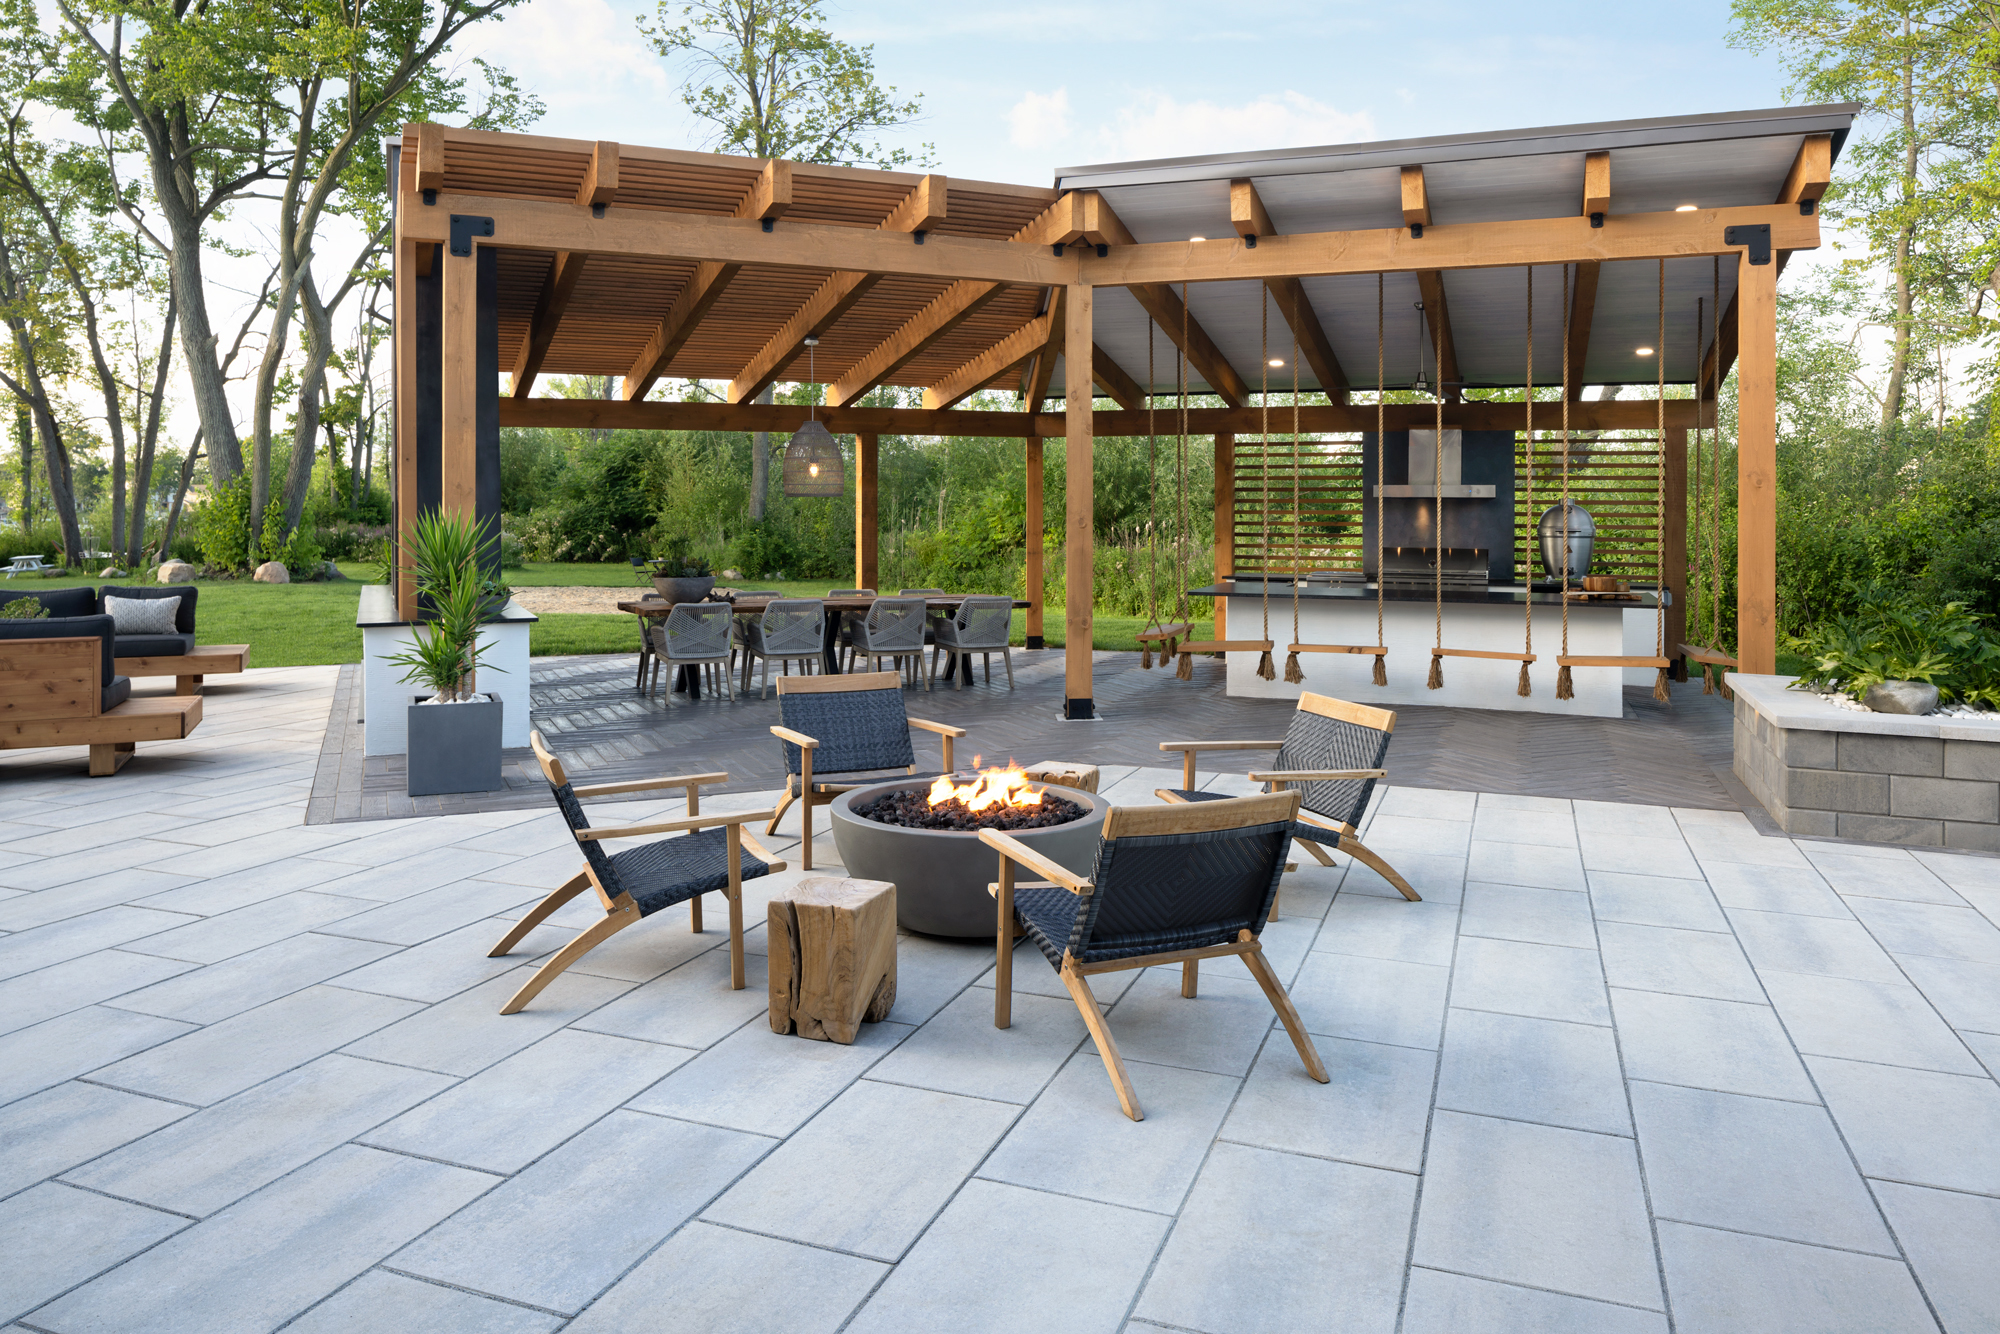 Blu Grande Smooth patio slabs in Shale Grey